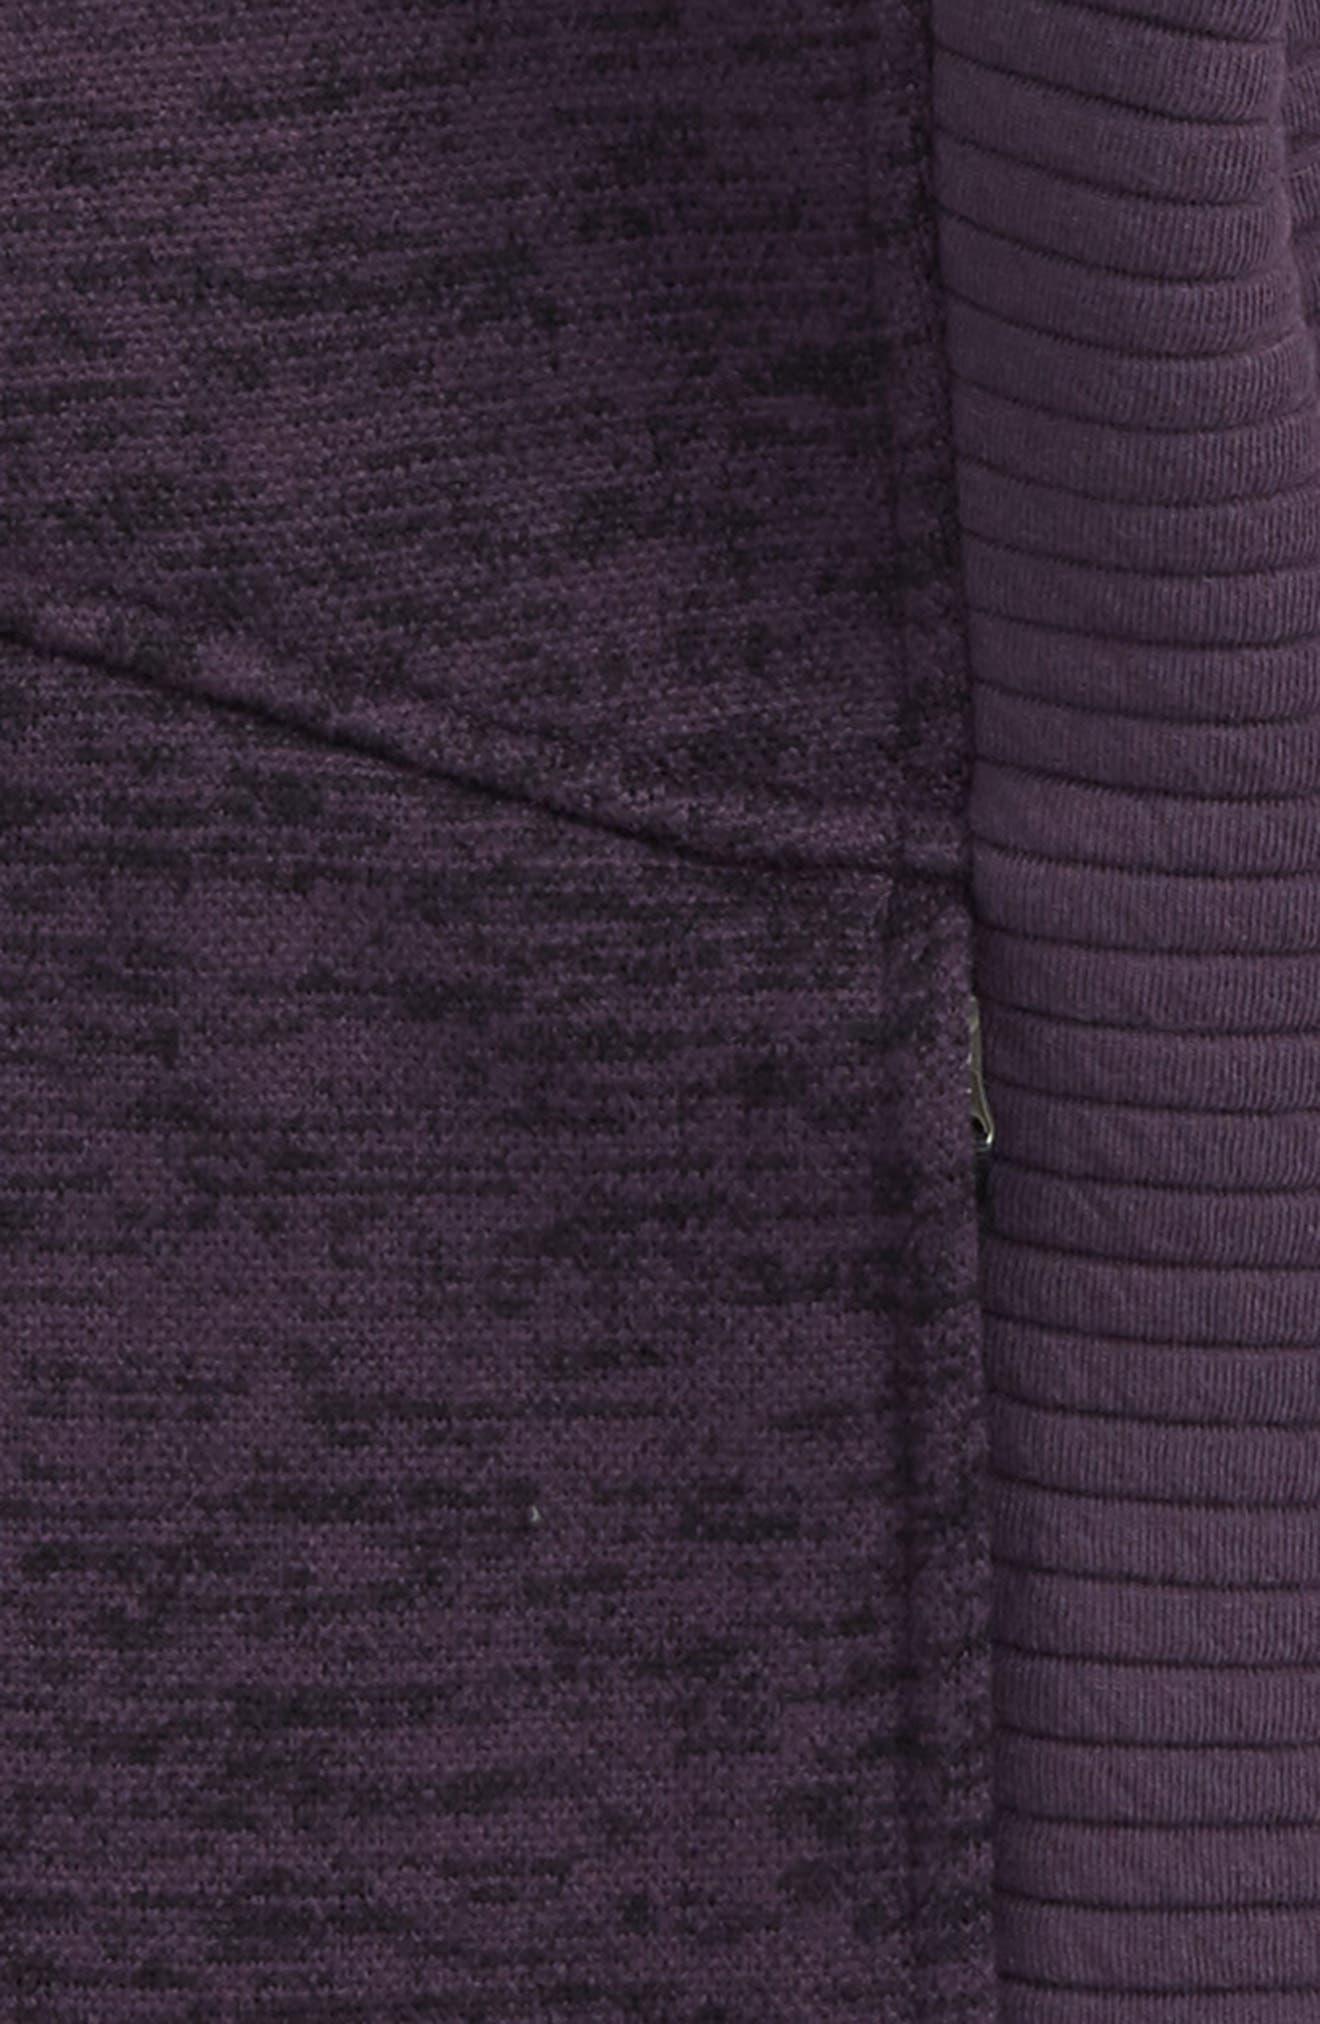 Alternate Image 2  - The North Face Indi 2 Hooded Knit Parka (Big Girls)